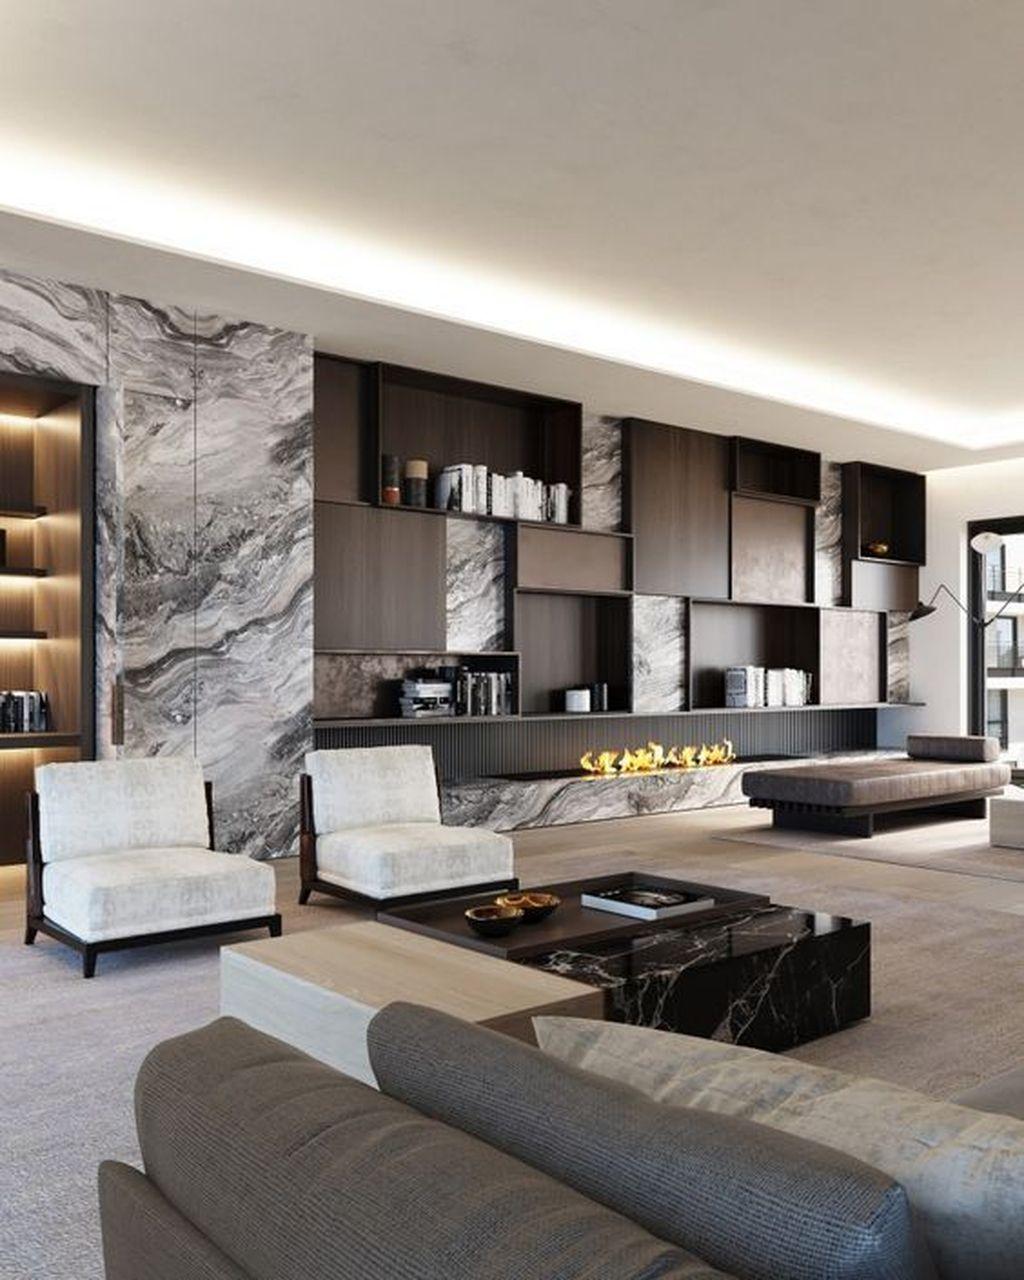 Admirable Mid Century Modern House Design Ideas 08